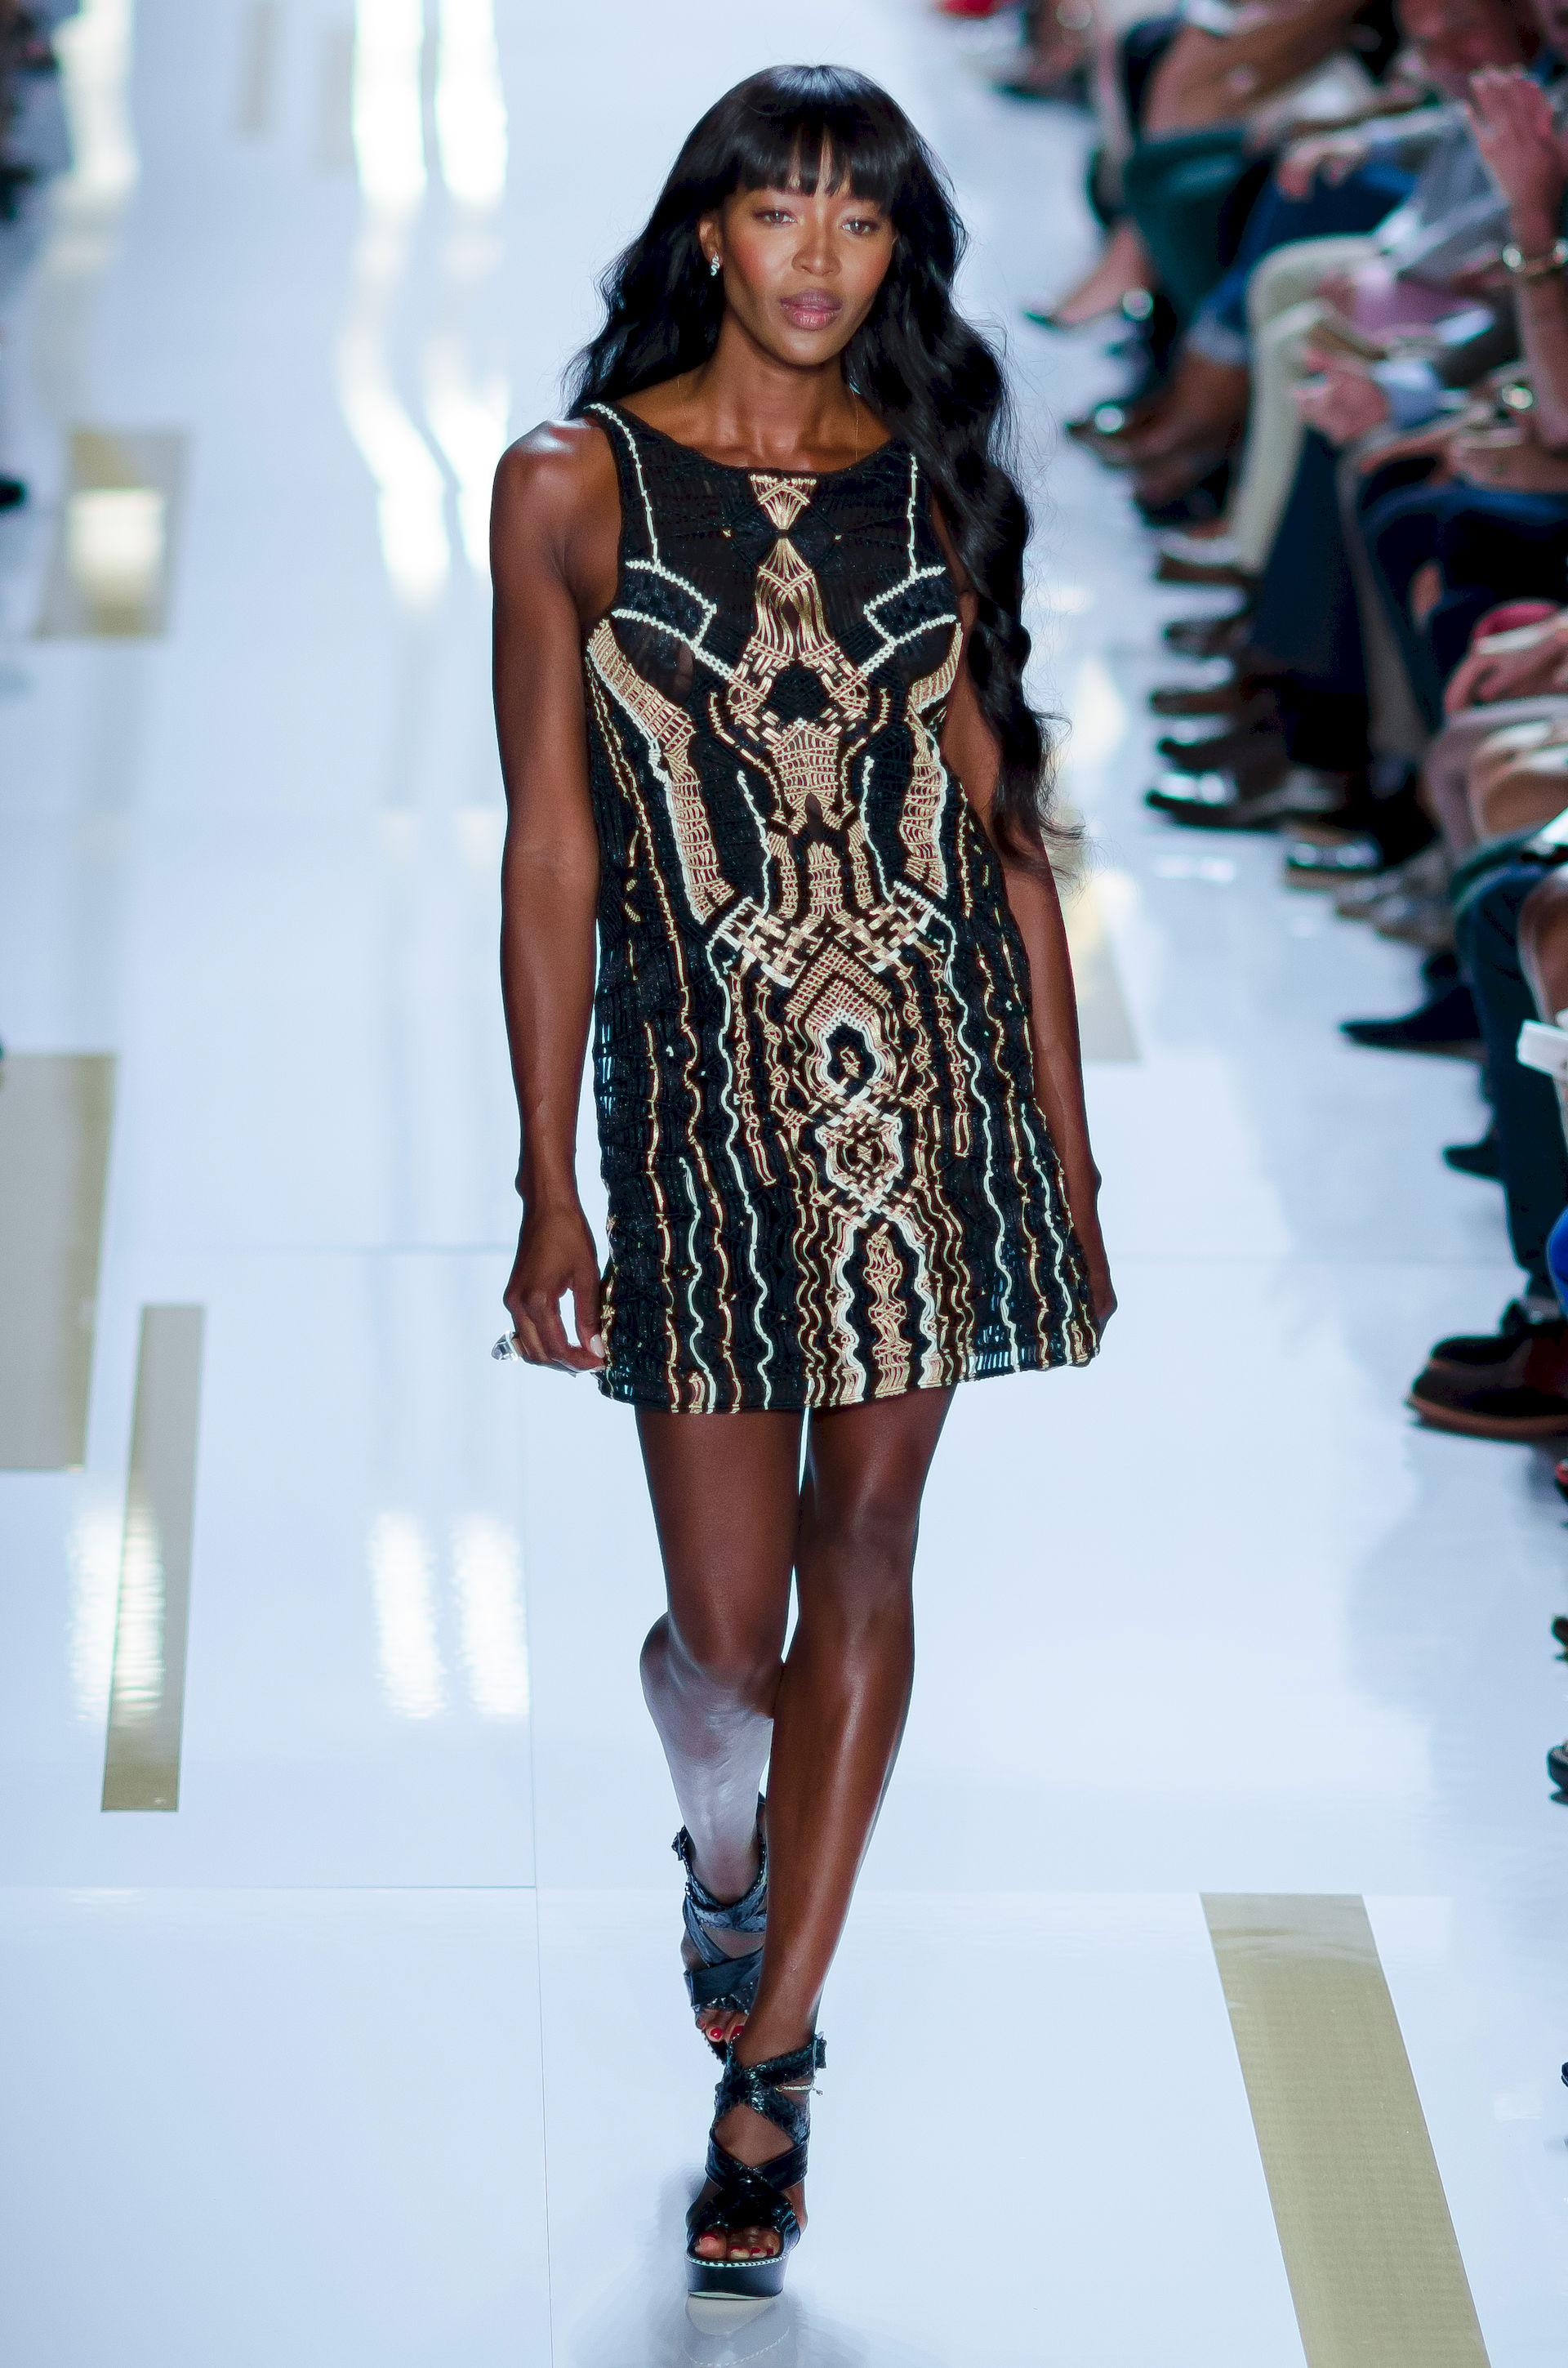 Photo of Naomi Campbell: British model